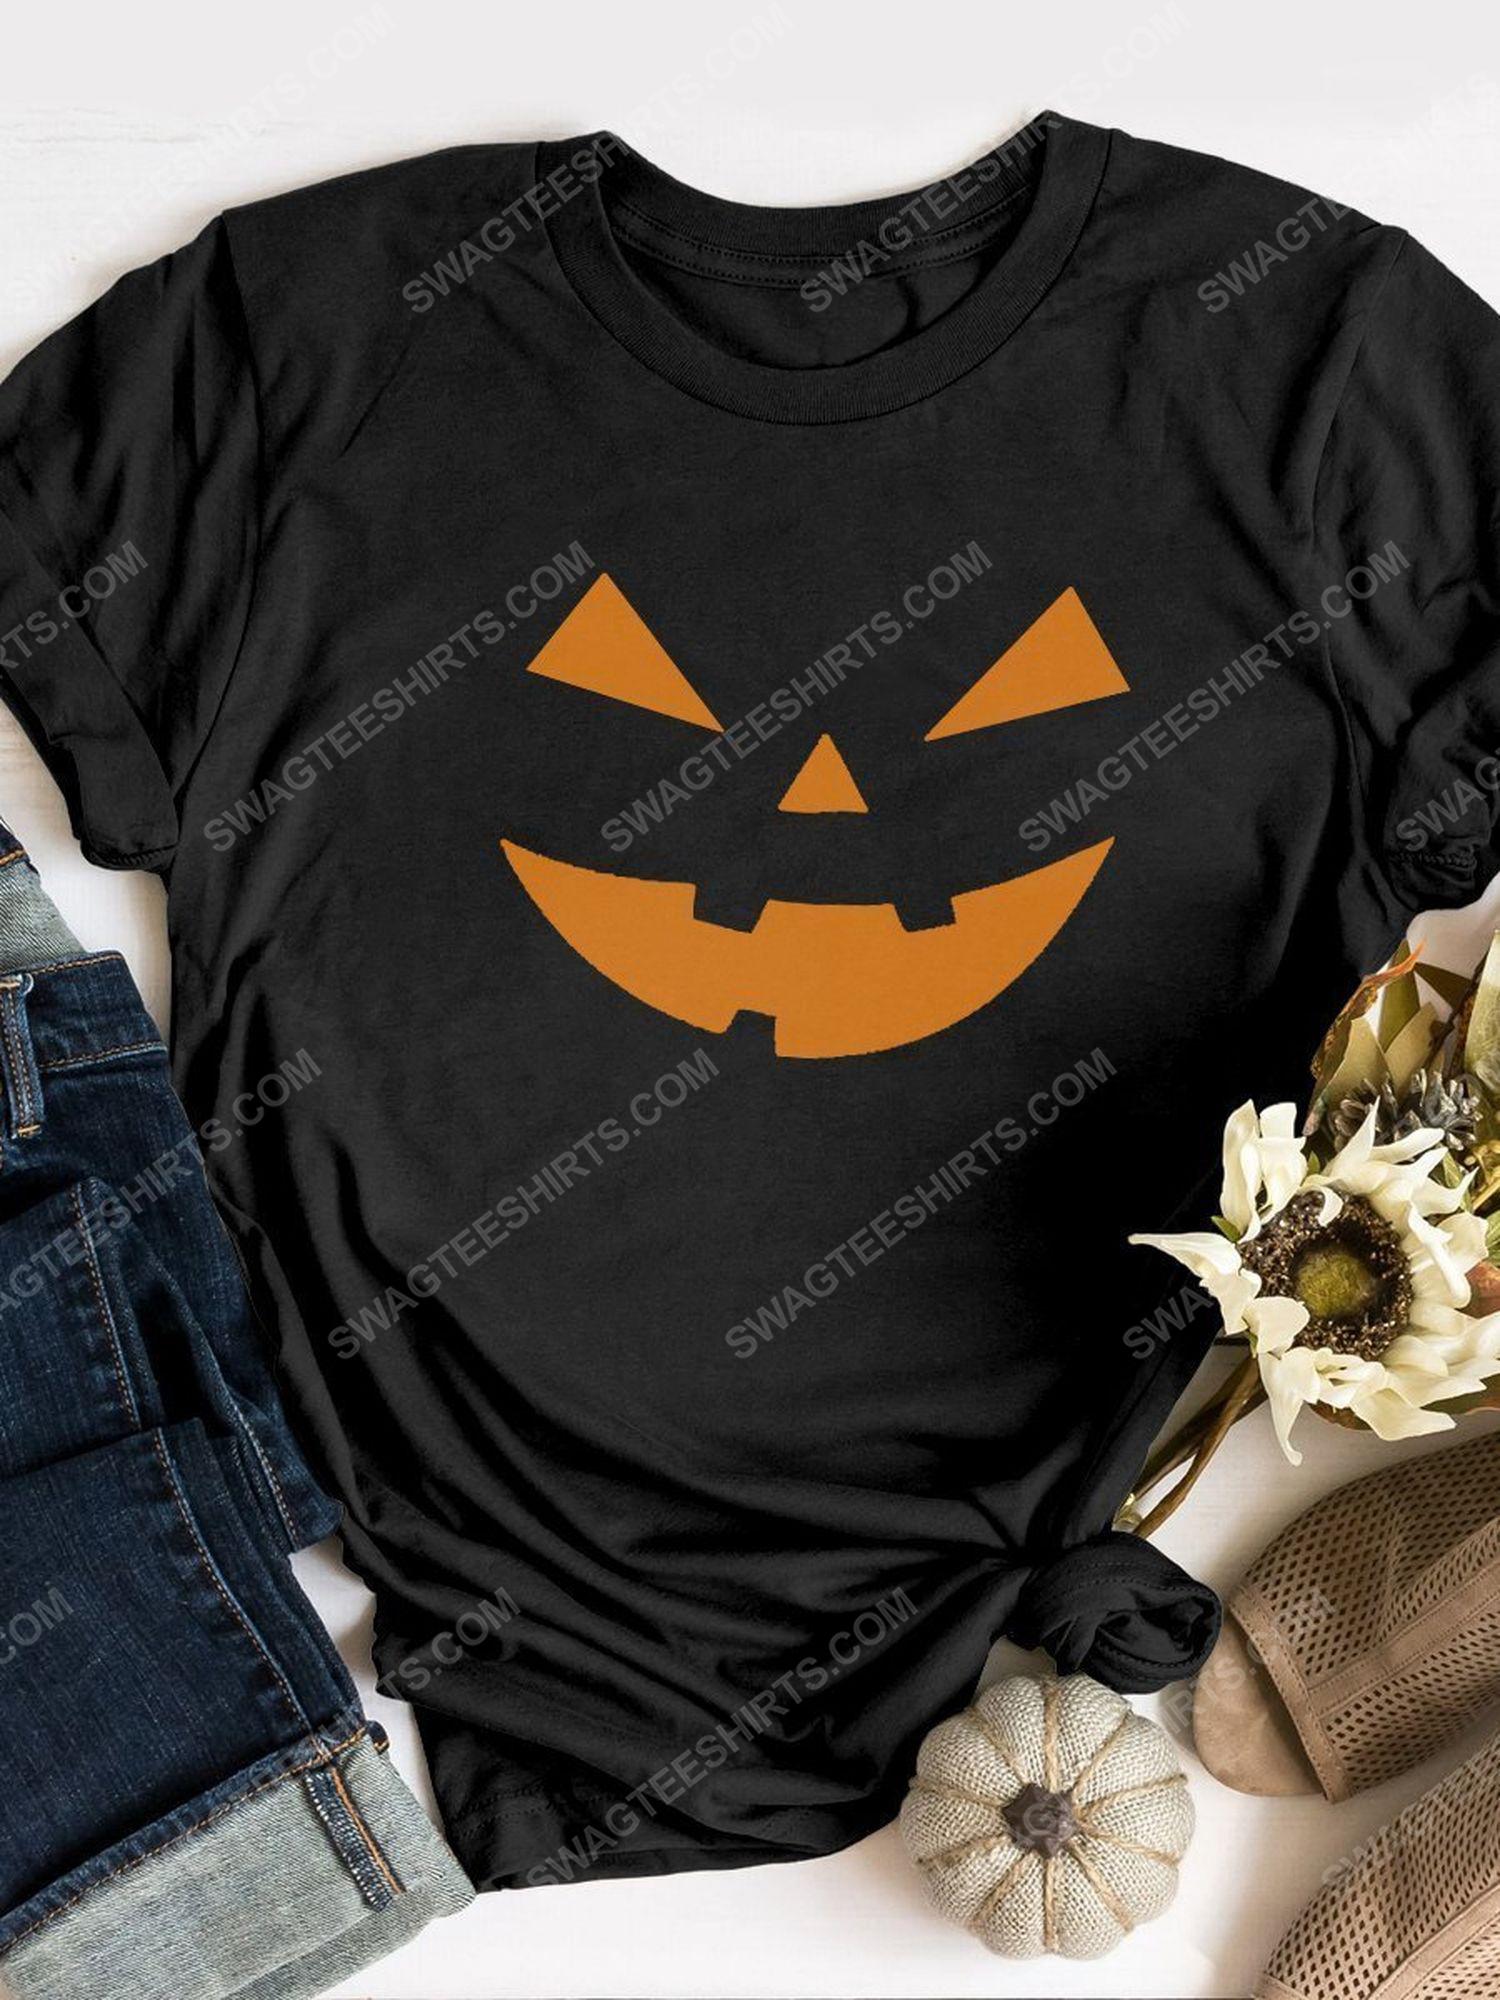 Halloween night and pumpkin face shirt 1 - Copy